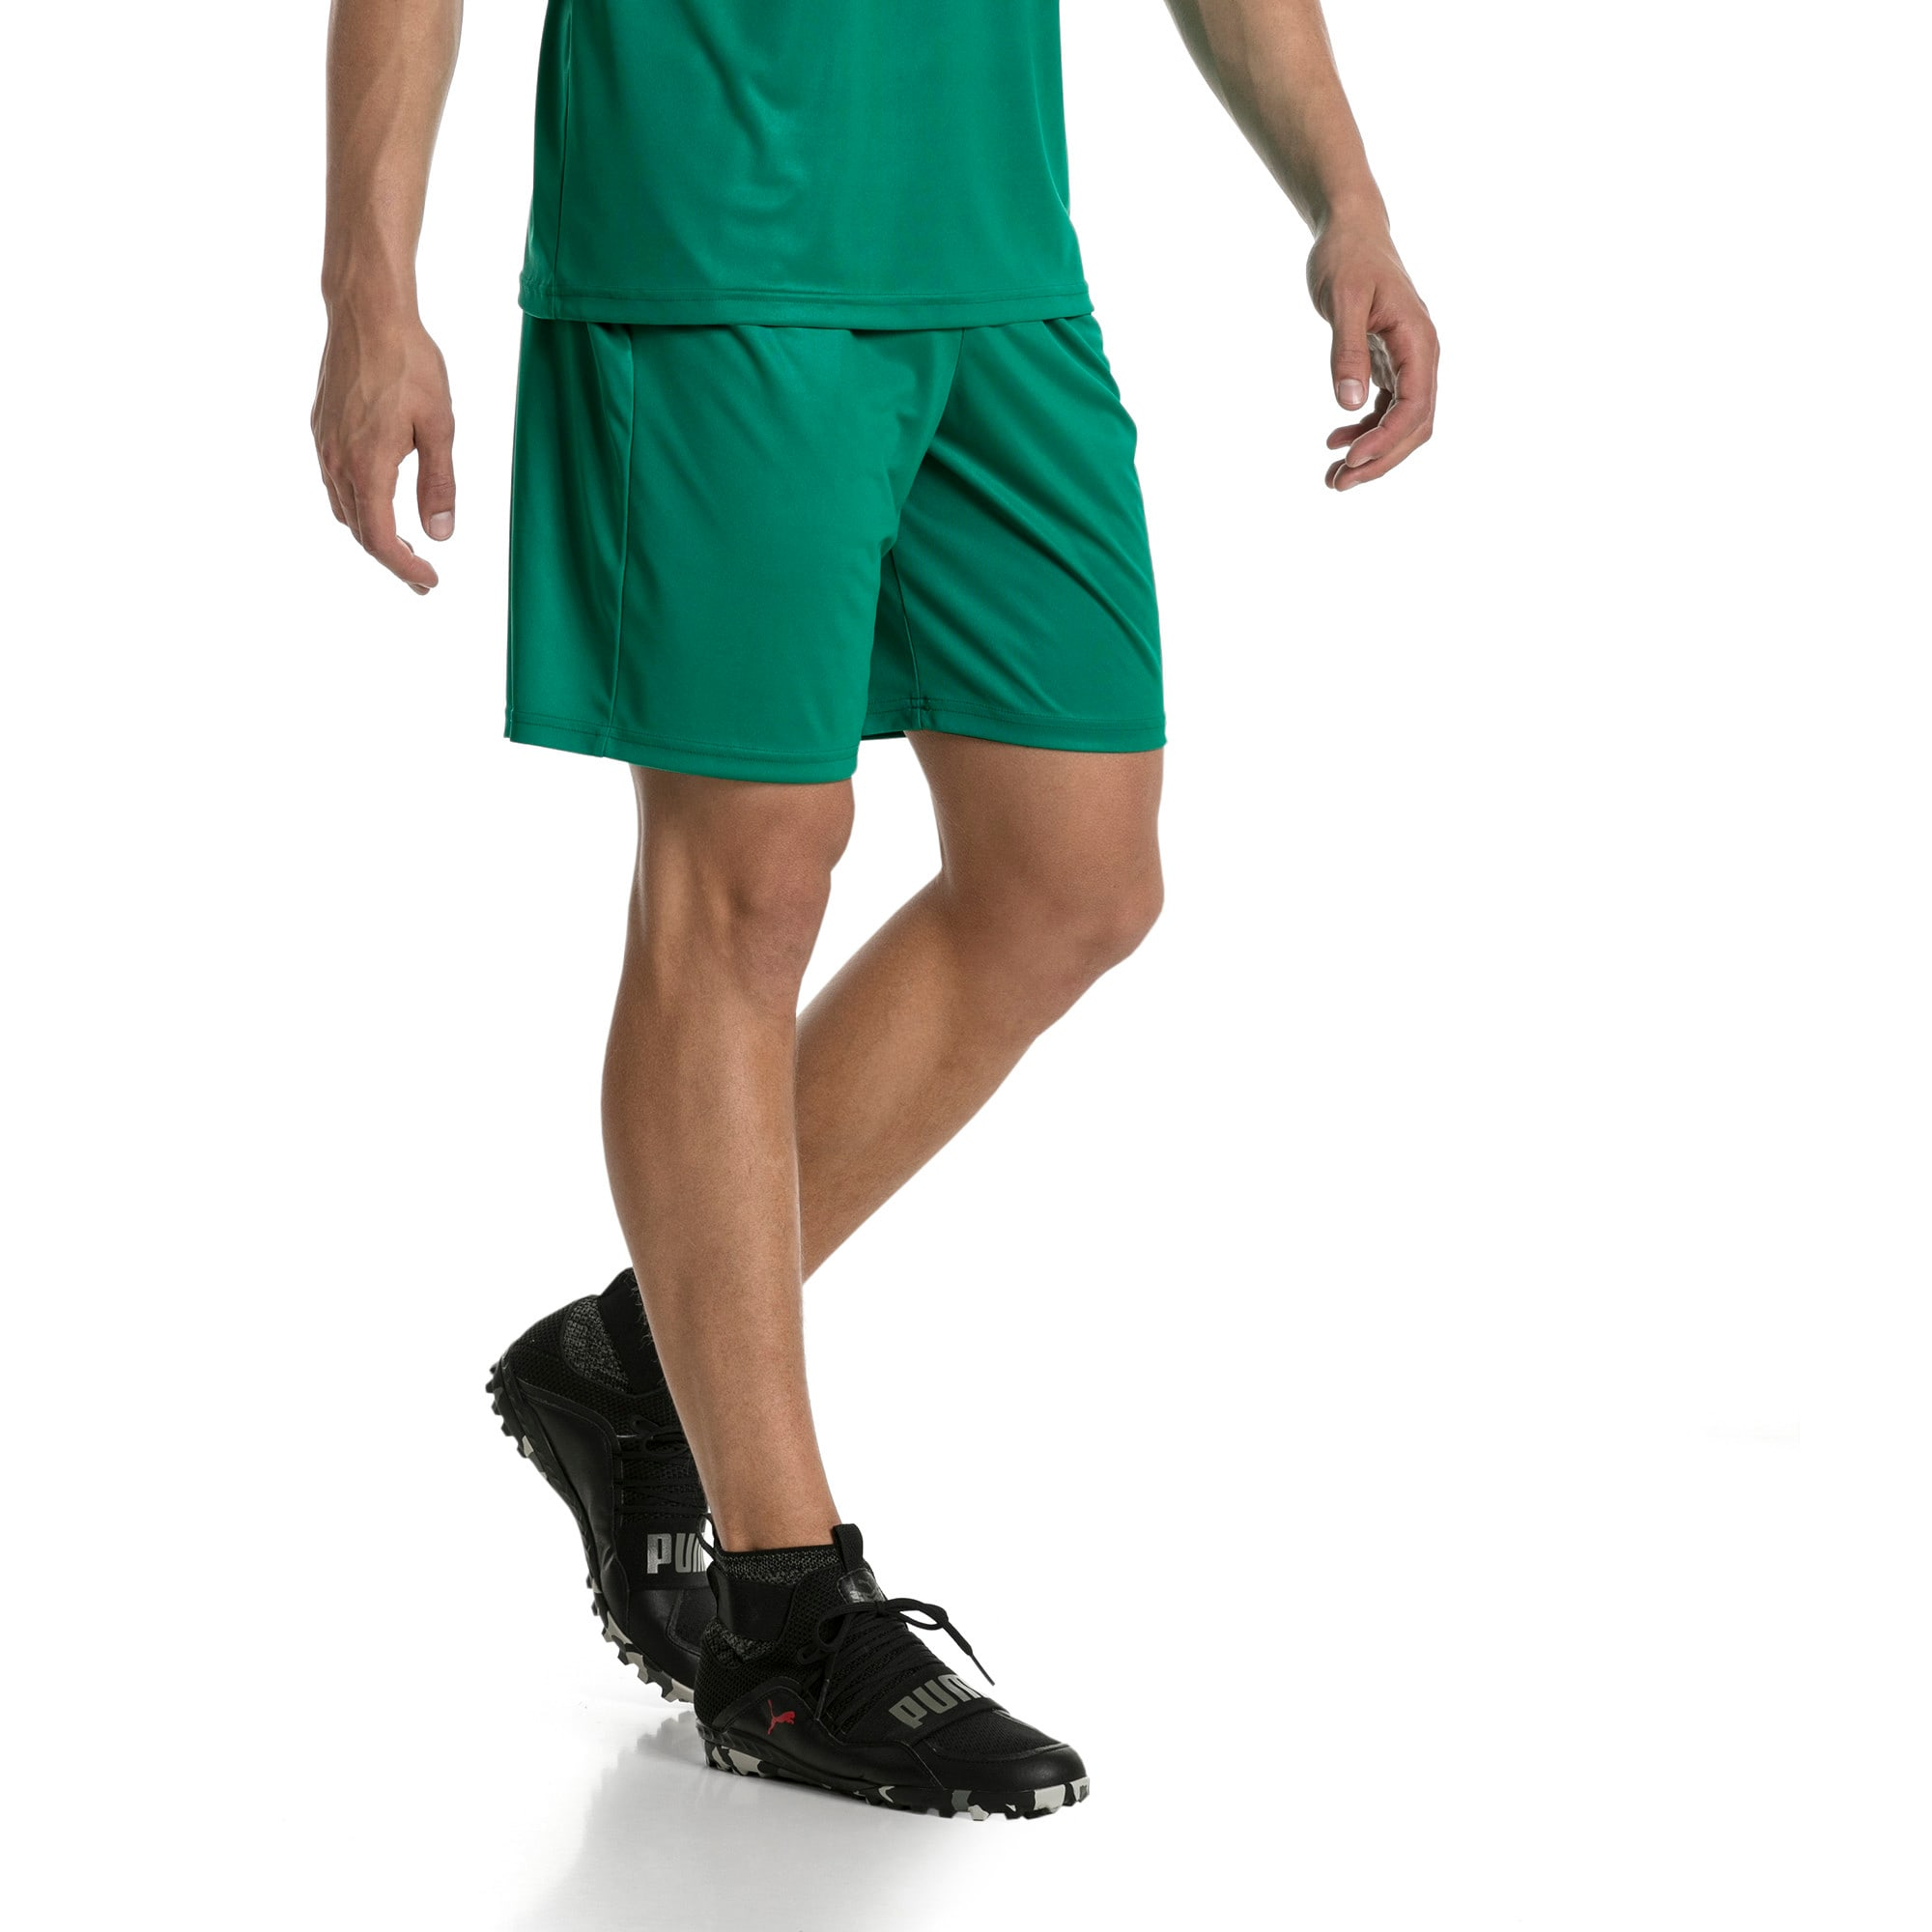 Thumbnail 2 of Liga Core Men's Shorts, Pepper Green-Puma White, medium